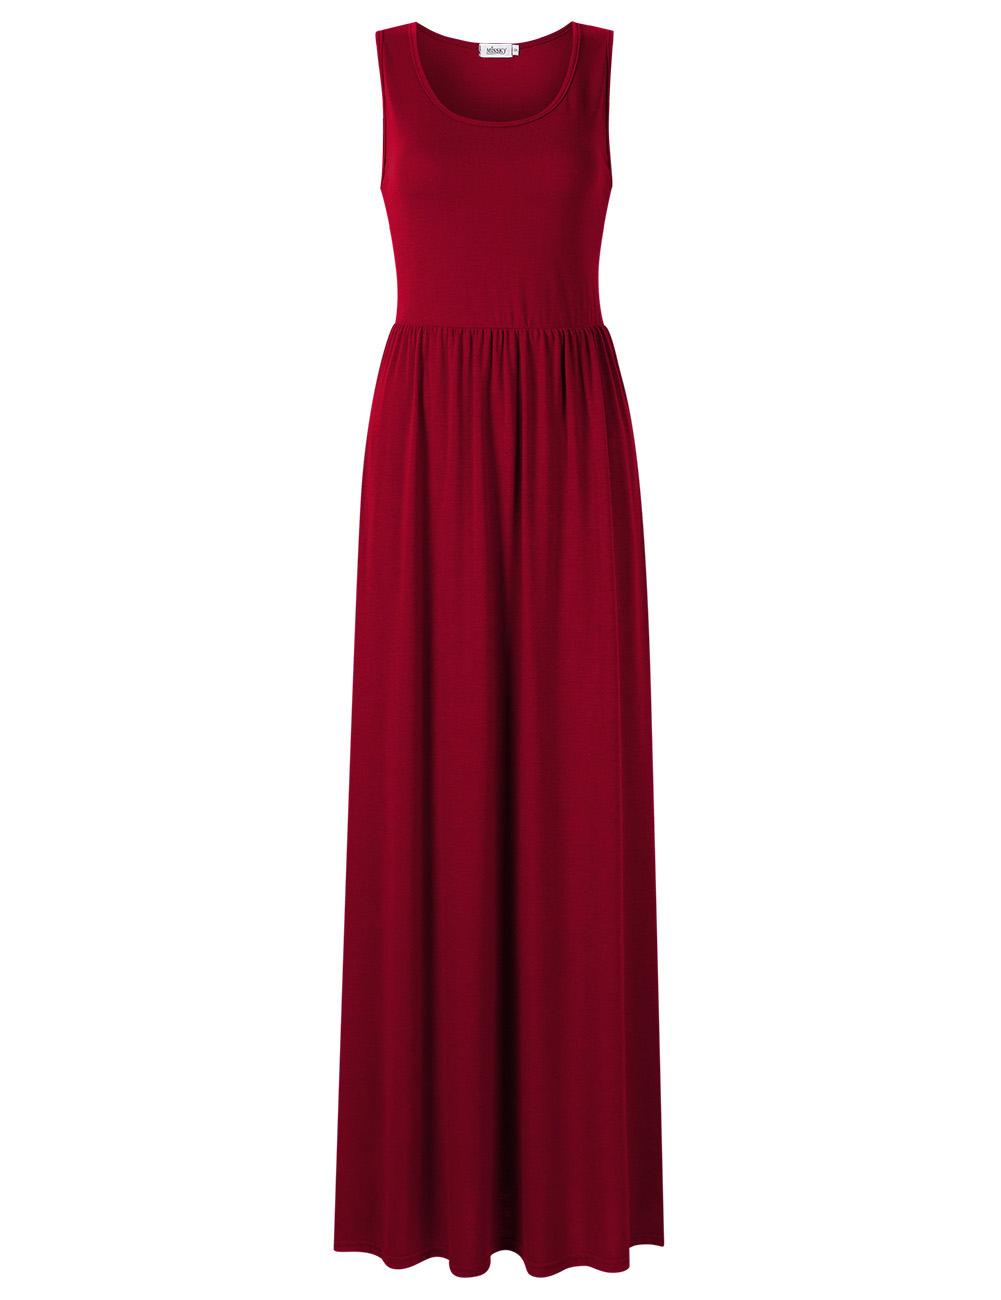 [US Direct] Ladies vest pleated pocket long skirt wine red 85_M missky